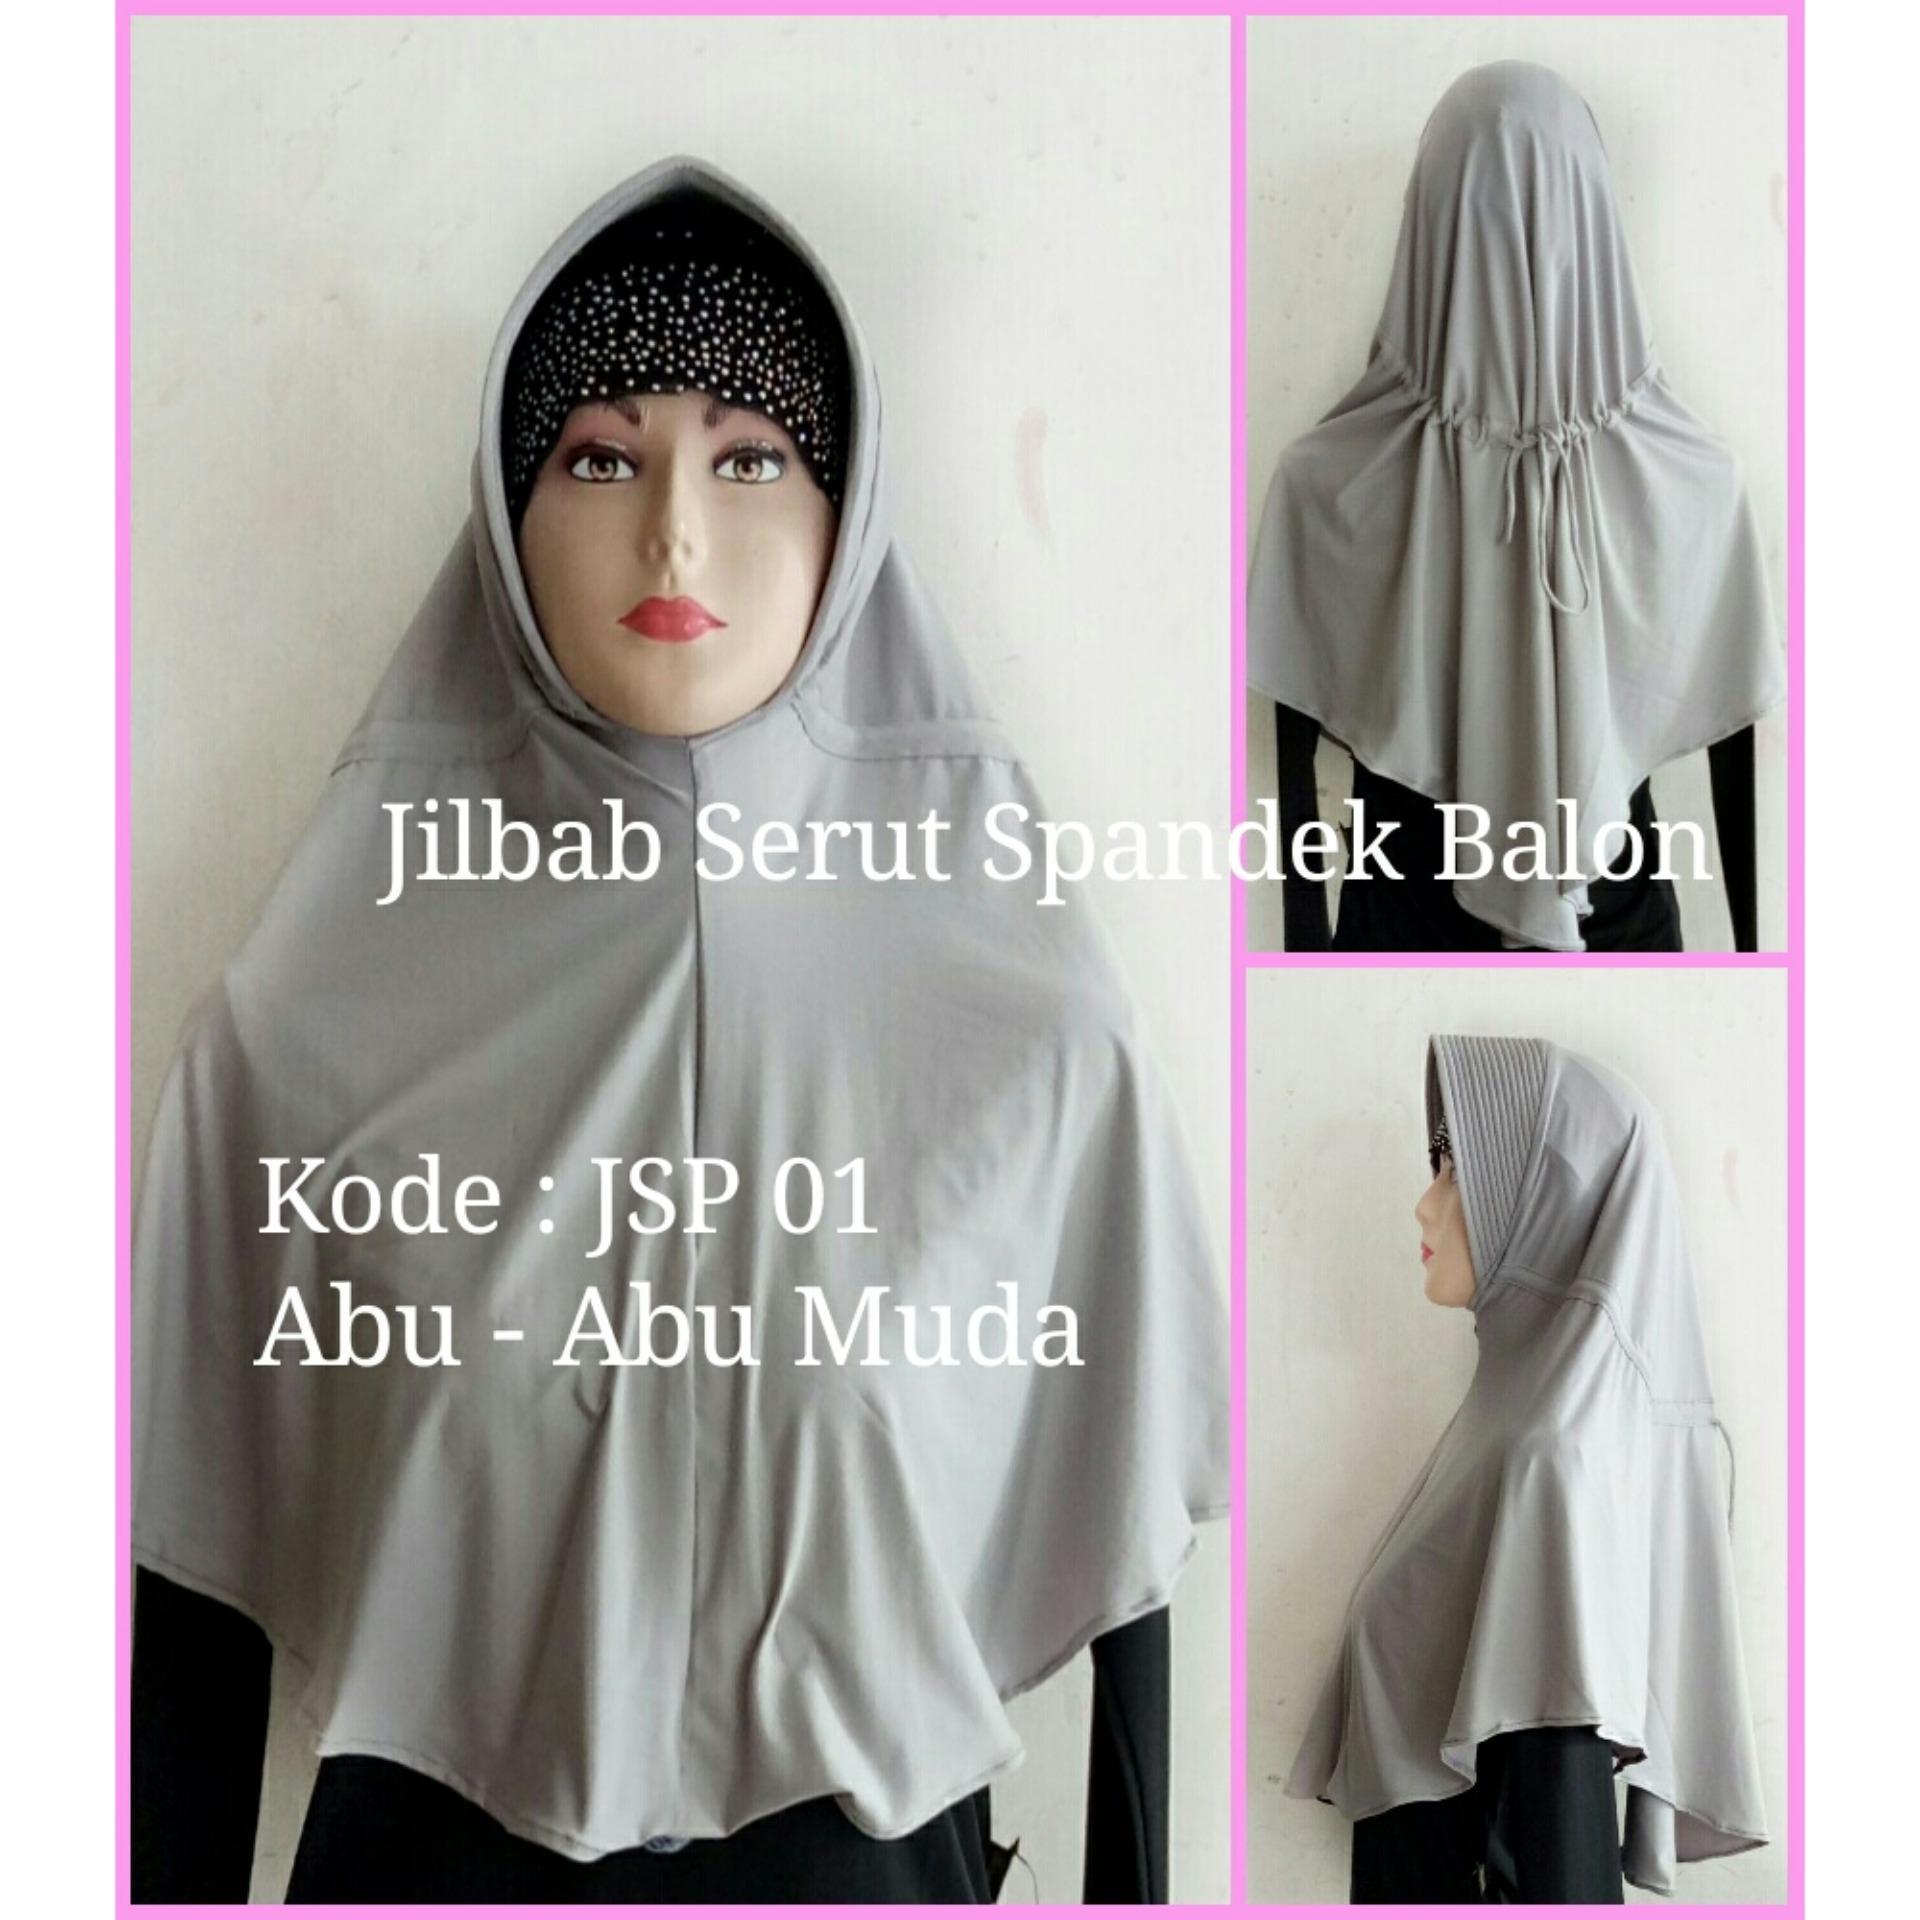 Syari Spandek Source Montaza Hijab Jilbab Instan Coklat Kerudung Geblus Pashmina Source Jilbab .